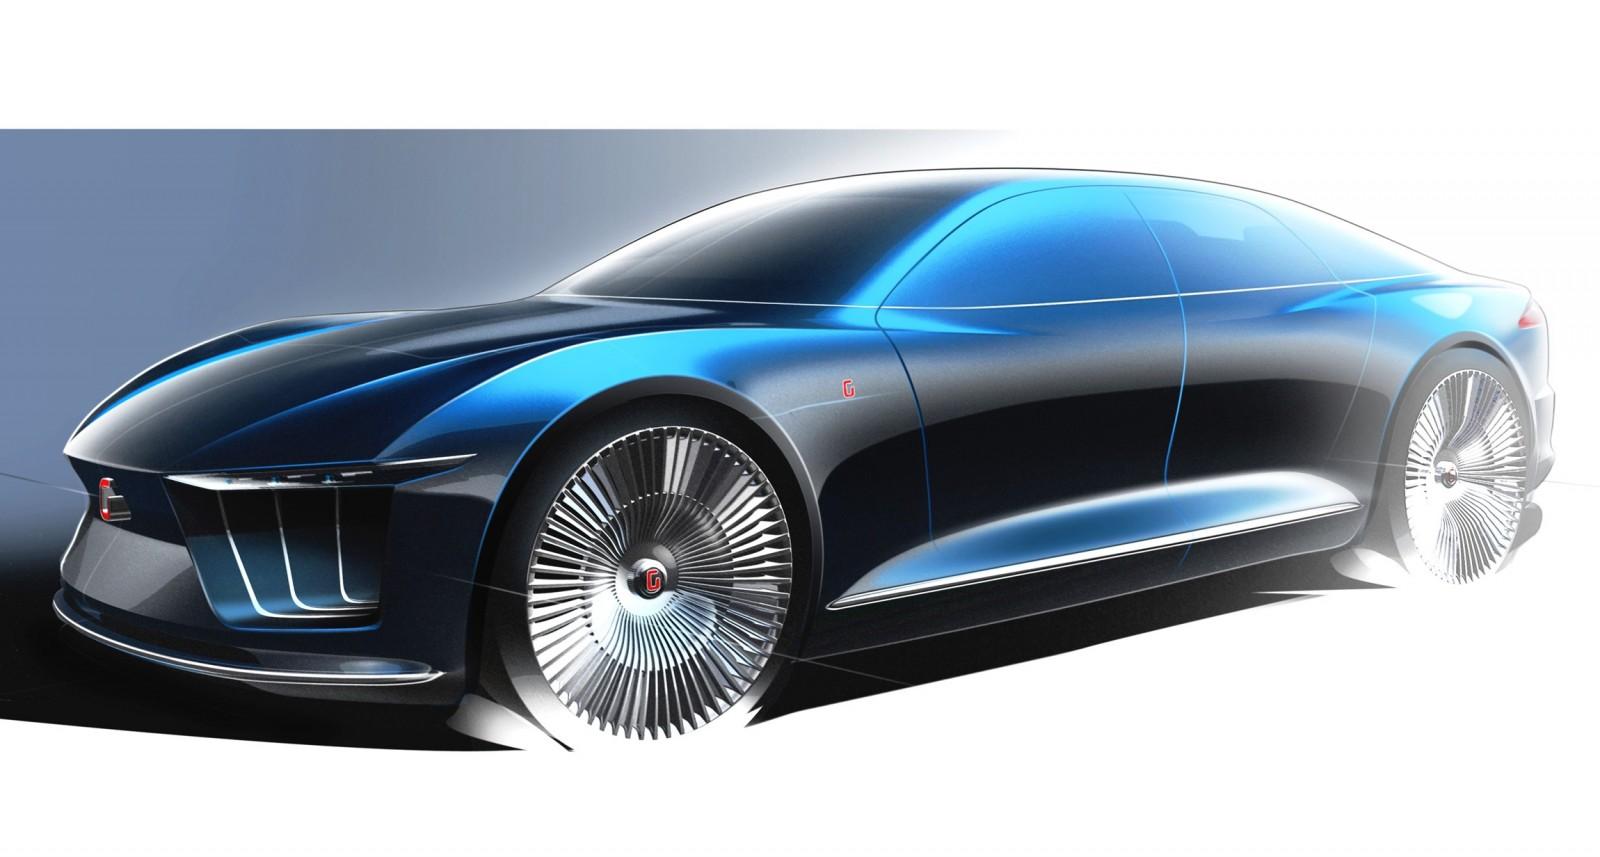 2015 ItalDesign Giugiaro GEA Concept 13